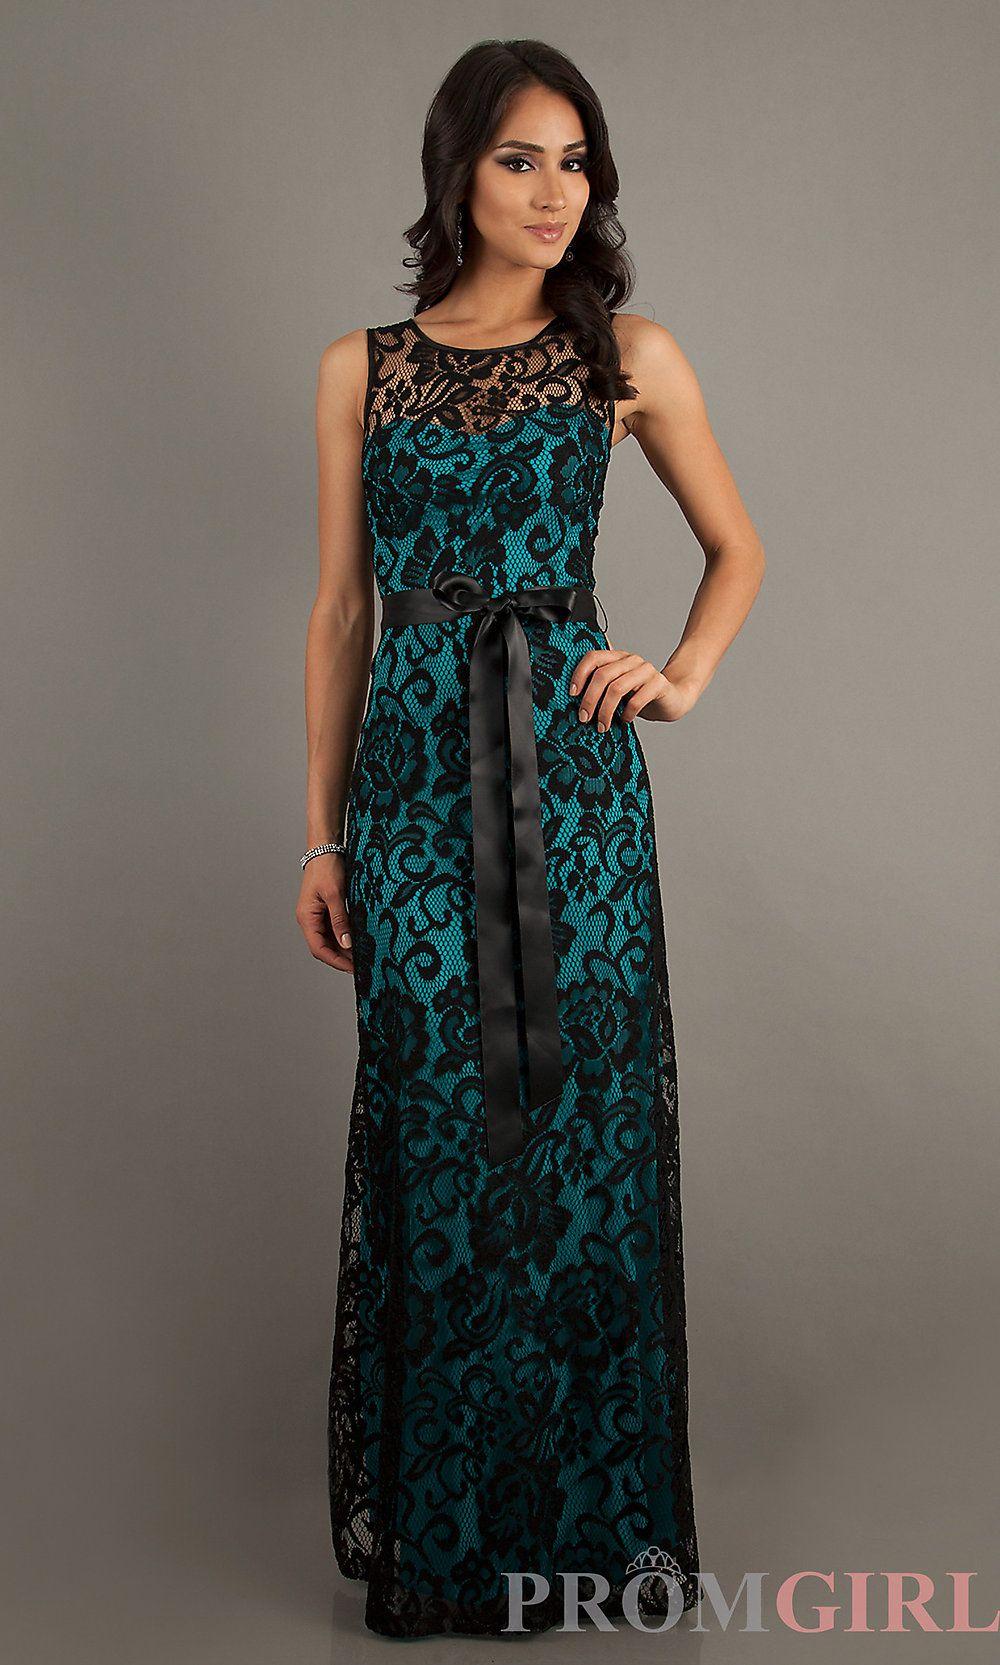 Teal and Black Floor Length Dresses